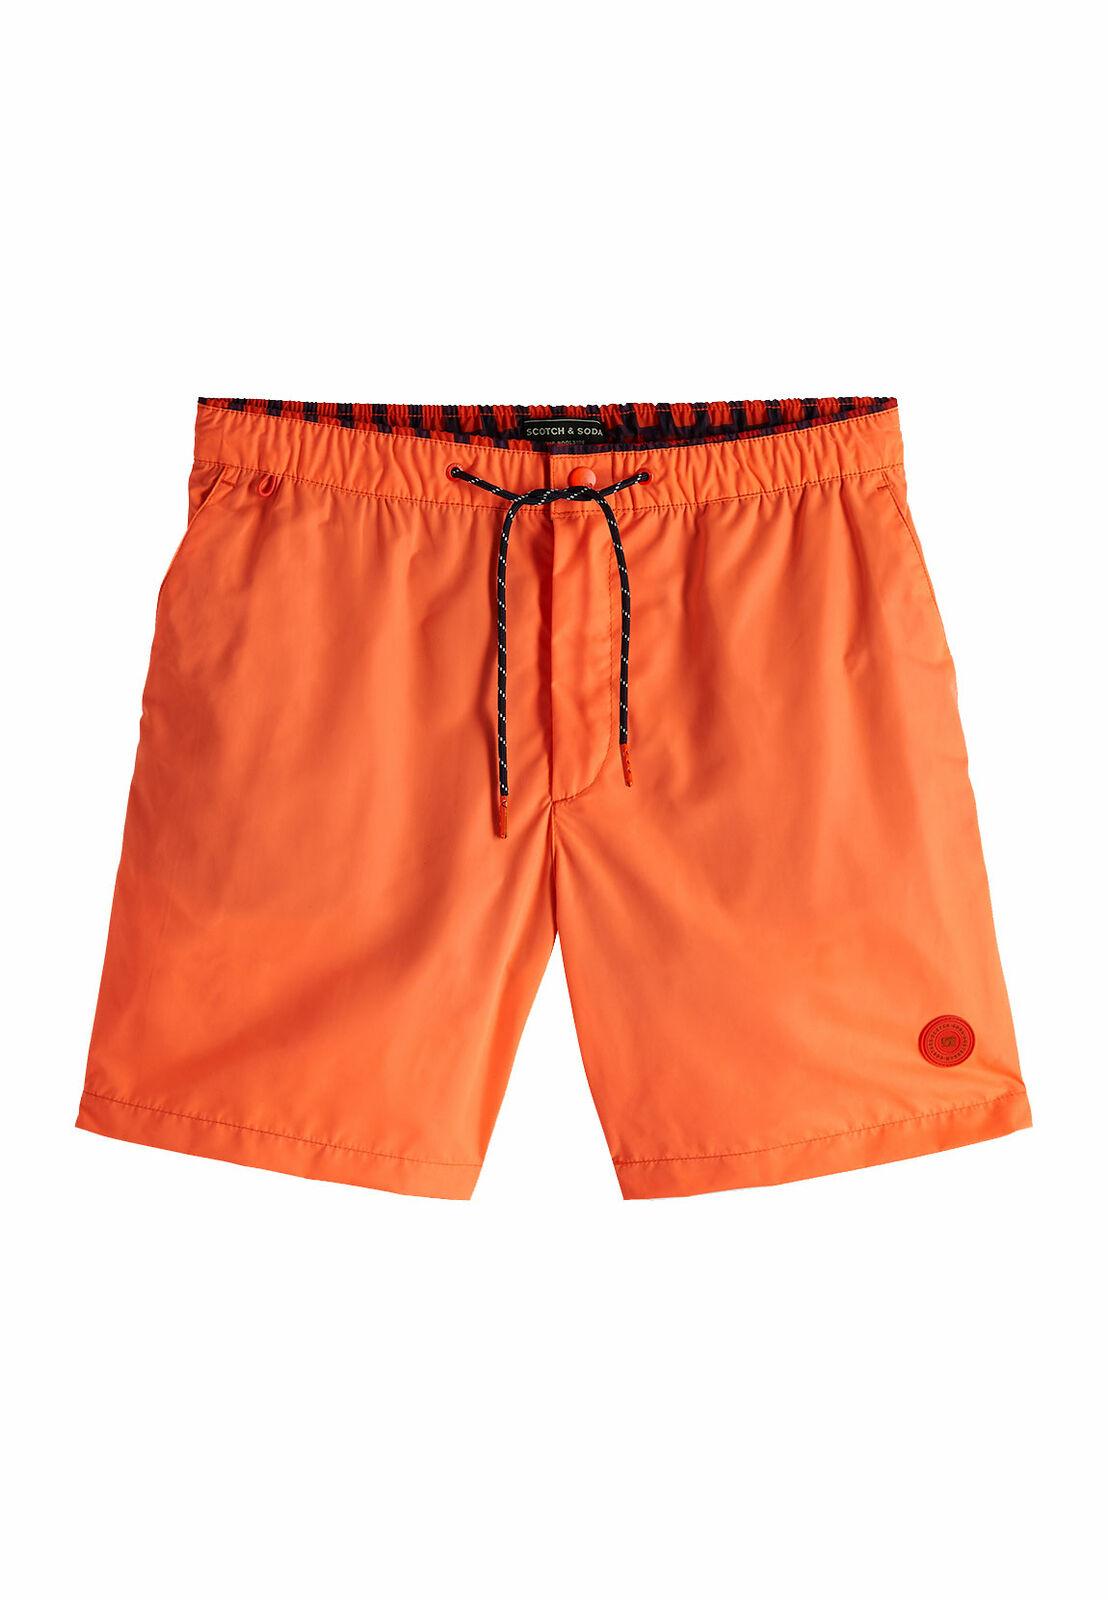 Scotch & Soda badeshorts  Classic colourful swimshort 148551 combo f 0222 naranja  encuentra tu favorito aquí